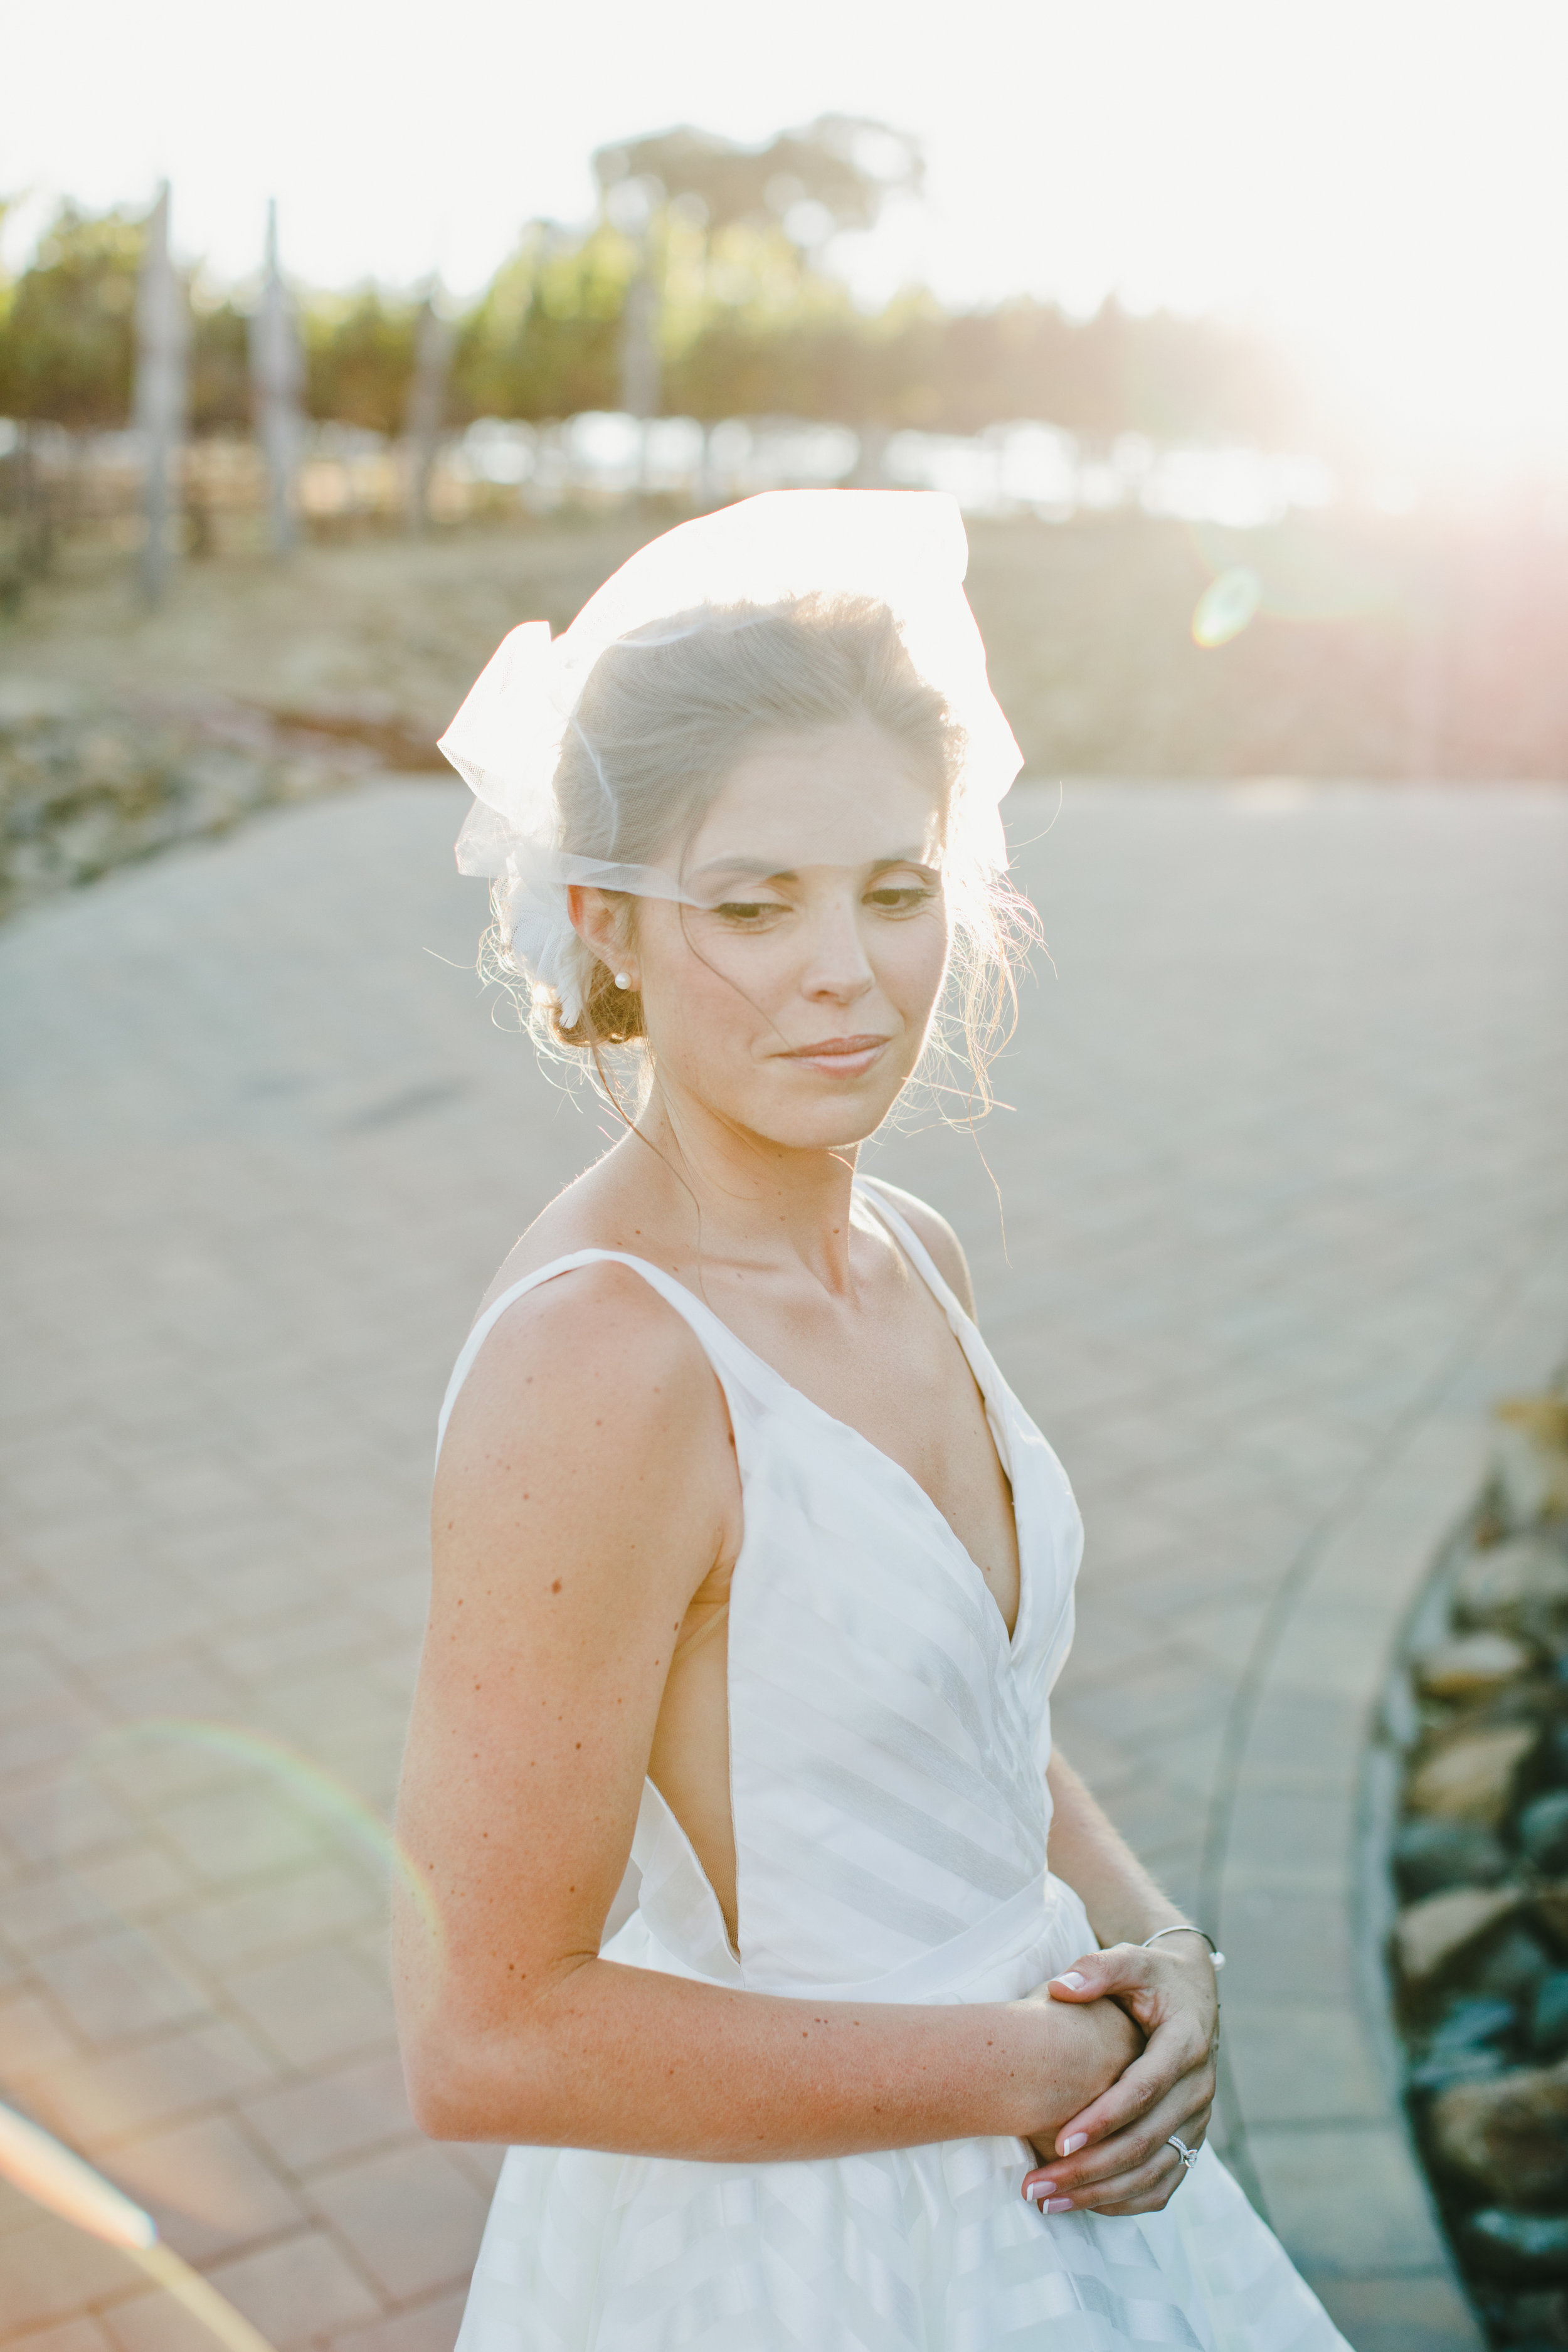 napa-makeup-and-hair-sonoma-makeup-artist-marin-wedding-makeup-san-francisco-airbrush-makeup-13.JPG